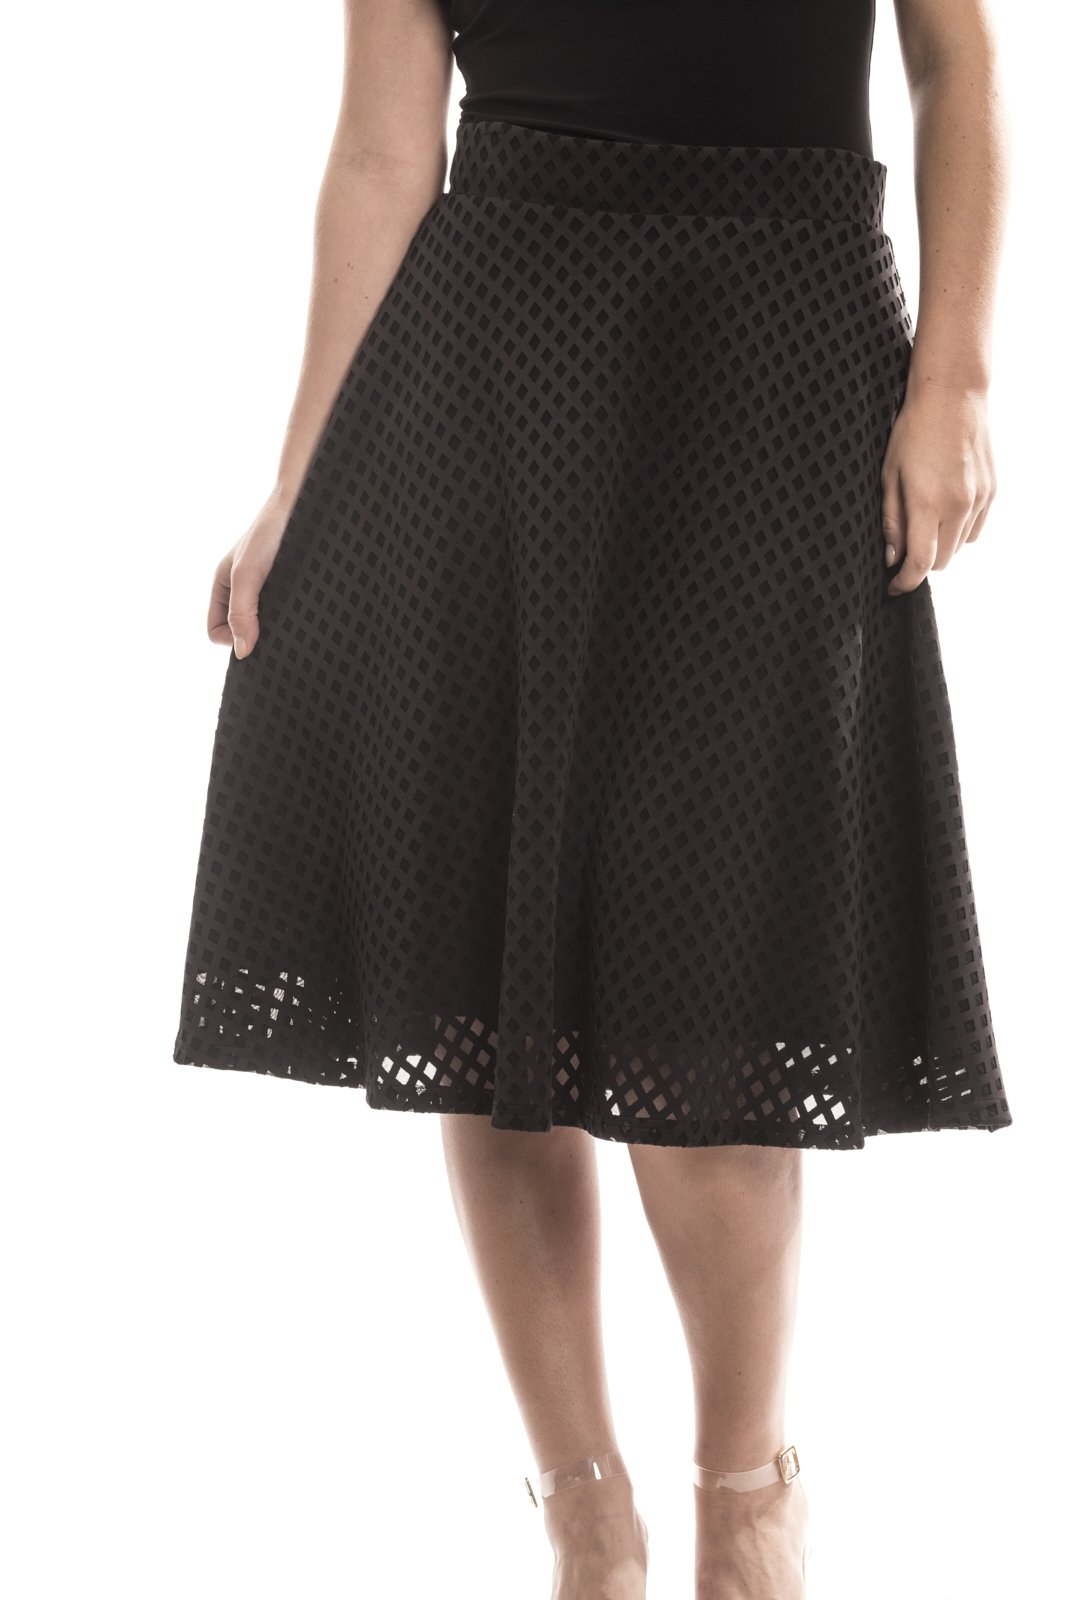 Joseph Ribkoff Black A-Line Laser Cut Skirt Style 173492 - Size 10